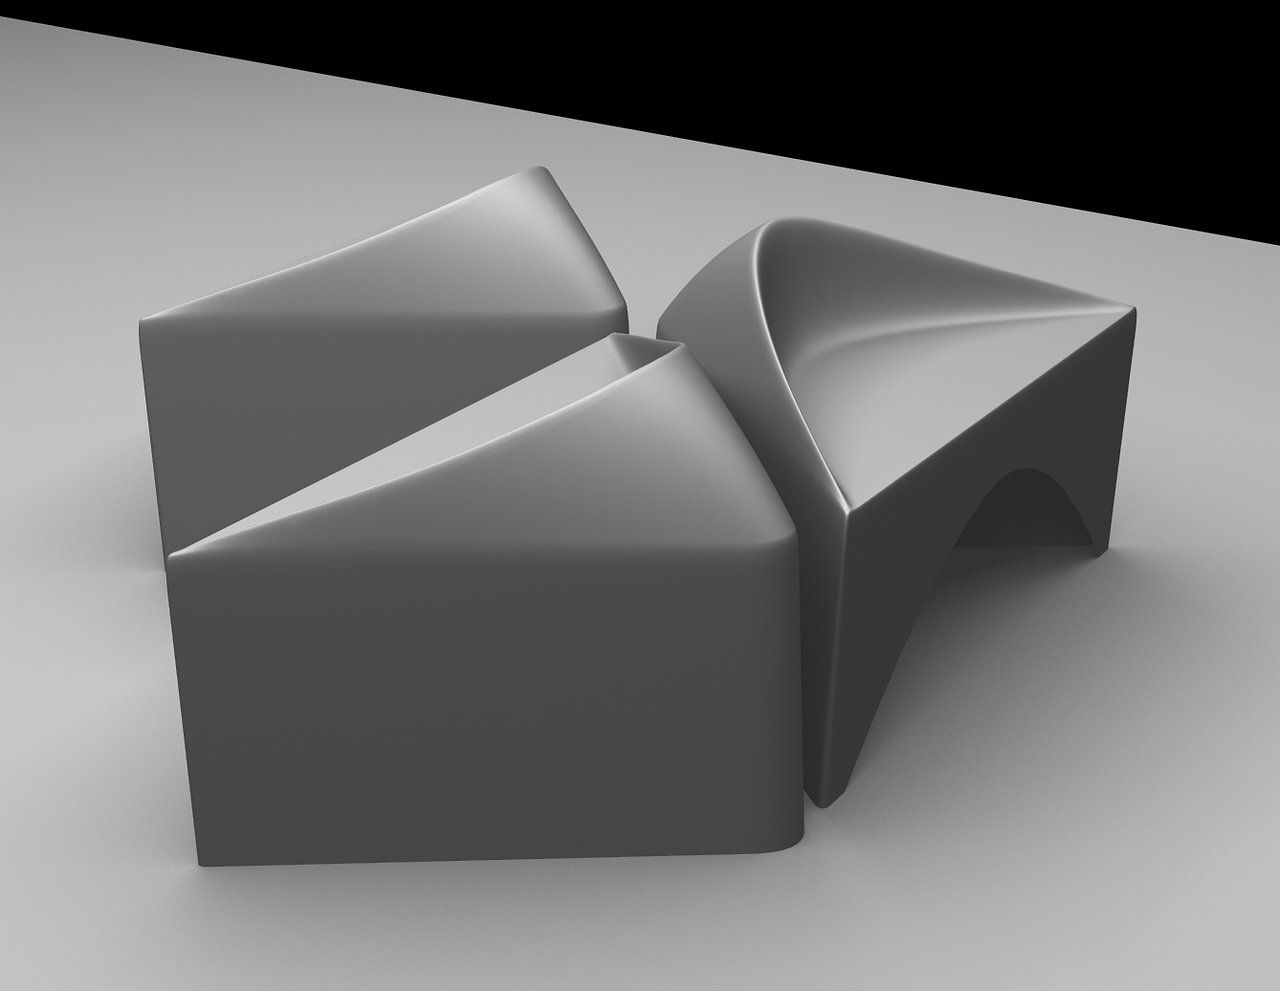 cv resume thomas leret designer couleurs mati res citro n. Black Bedroom Furniture Sets. Home Design Ideas